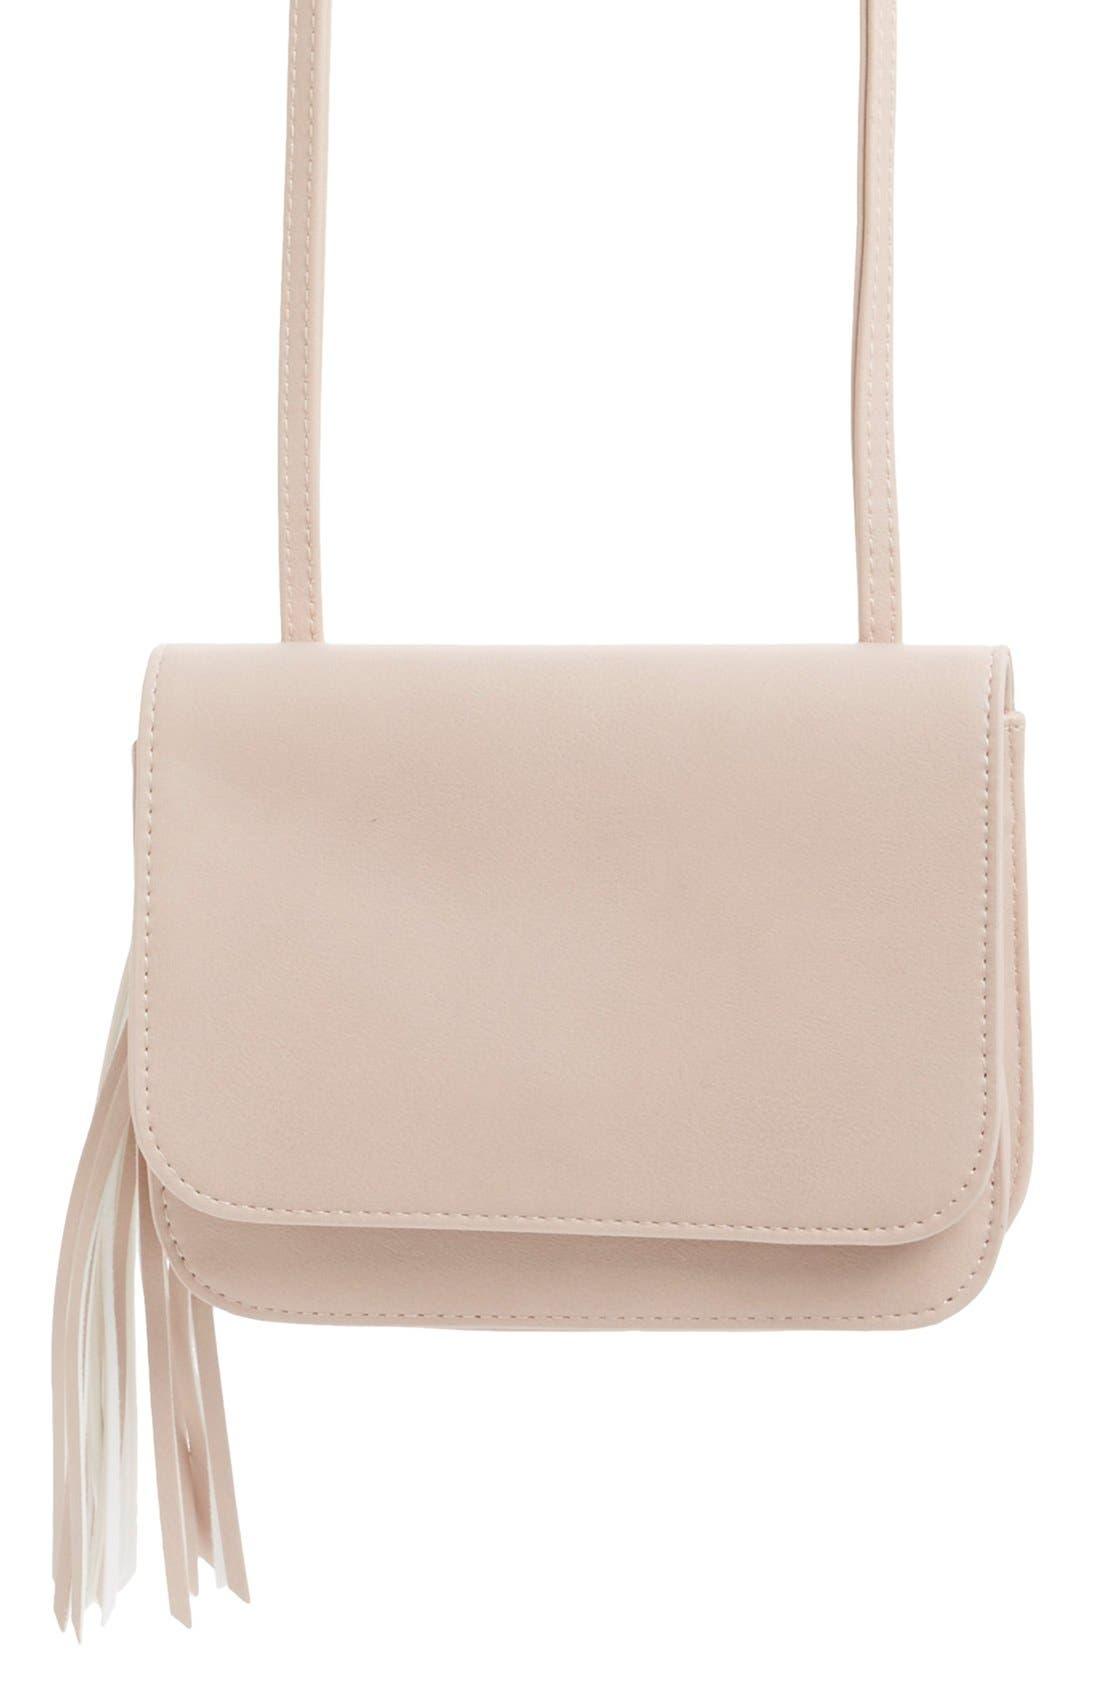 Tassel Crossbody Bag,                             Main thumbnail 1, color,                             Blush